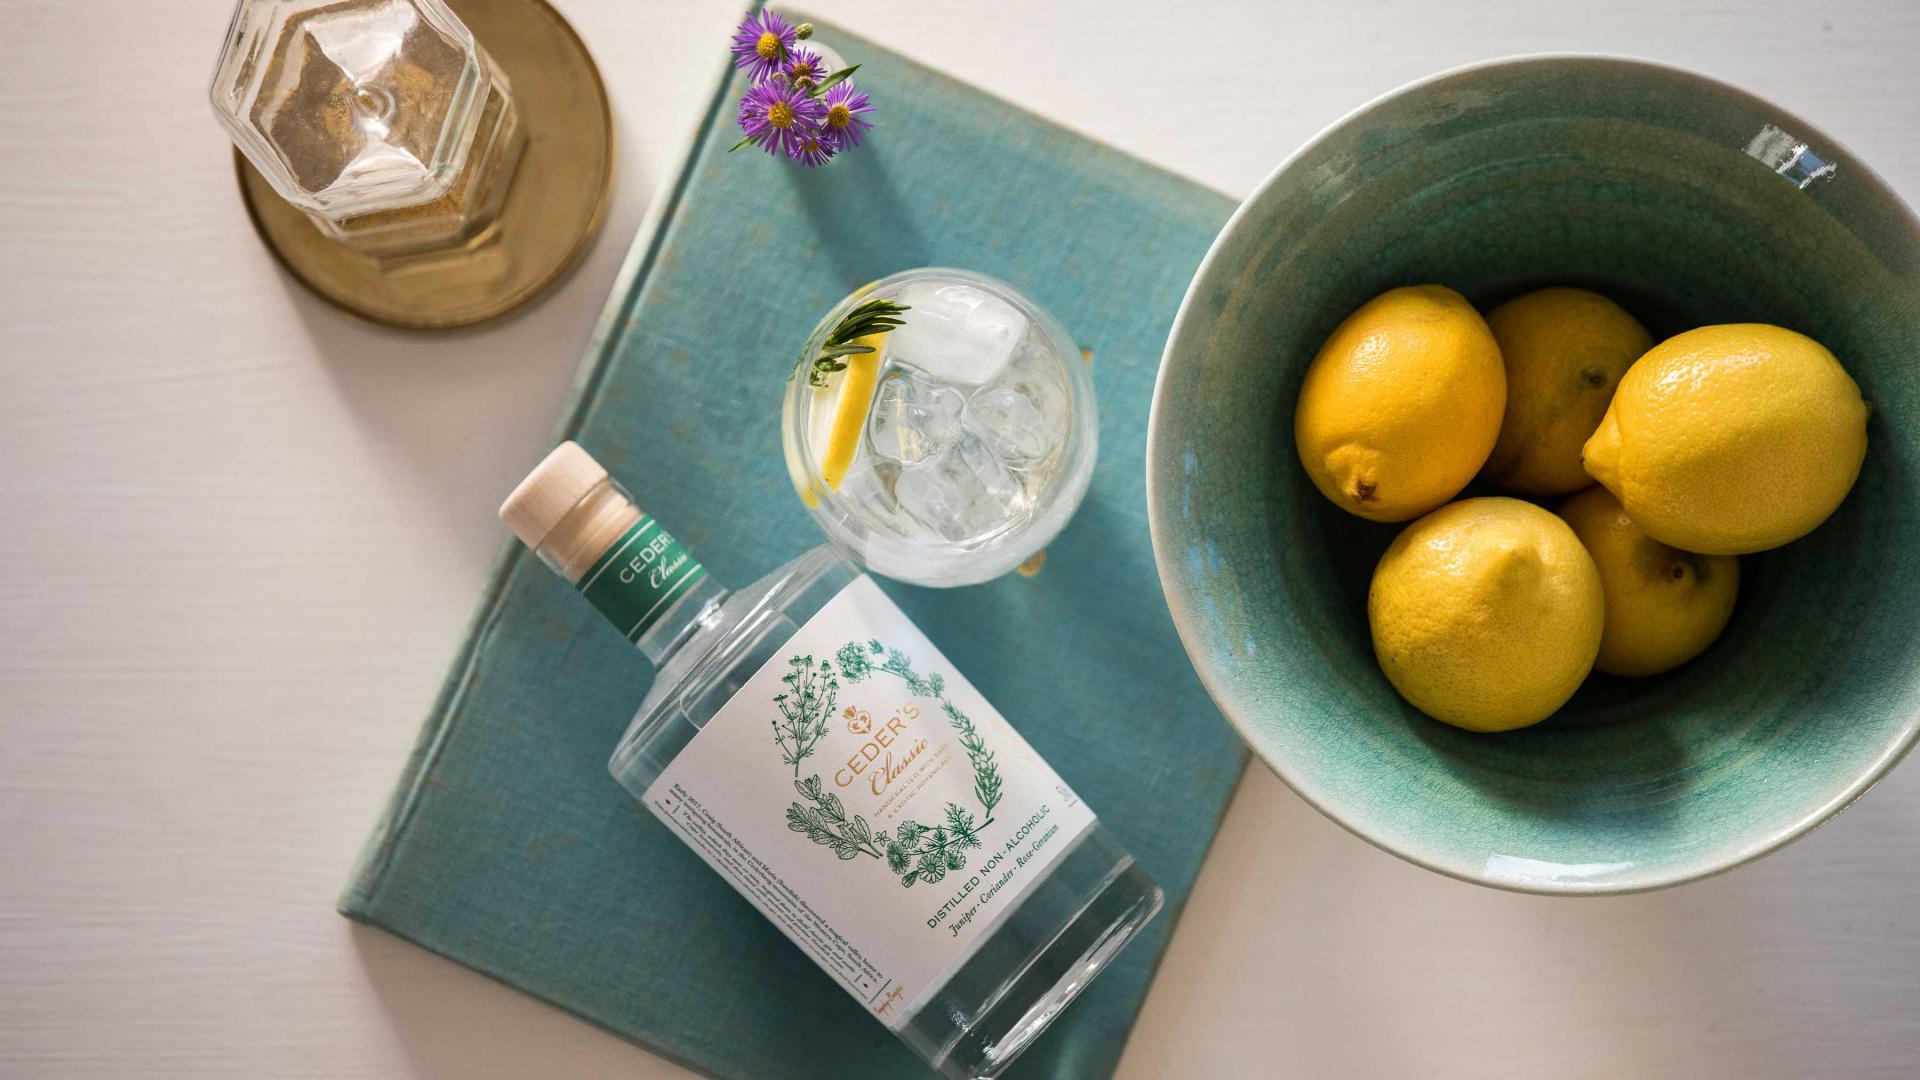 10 Best Non-Alcoholic Spirits: Ceder's Alt Gin